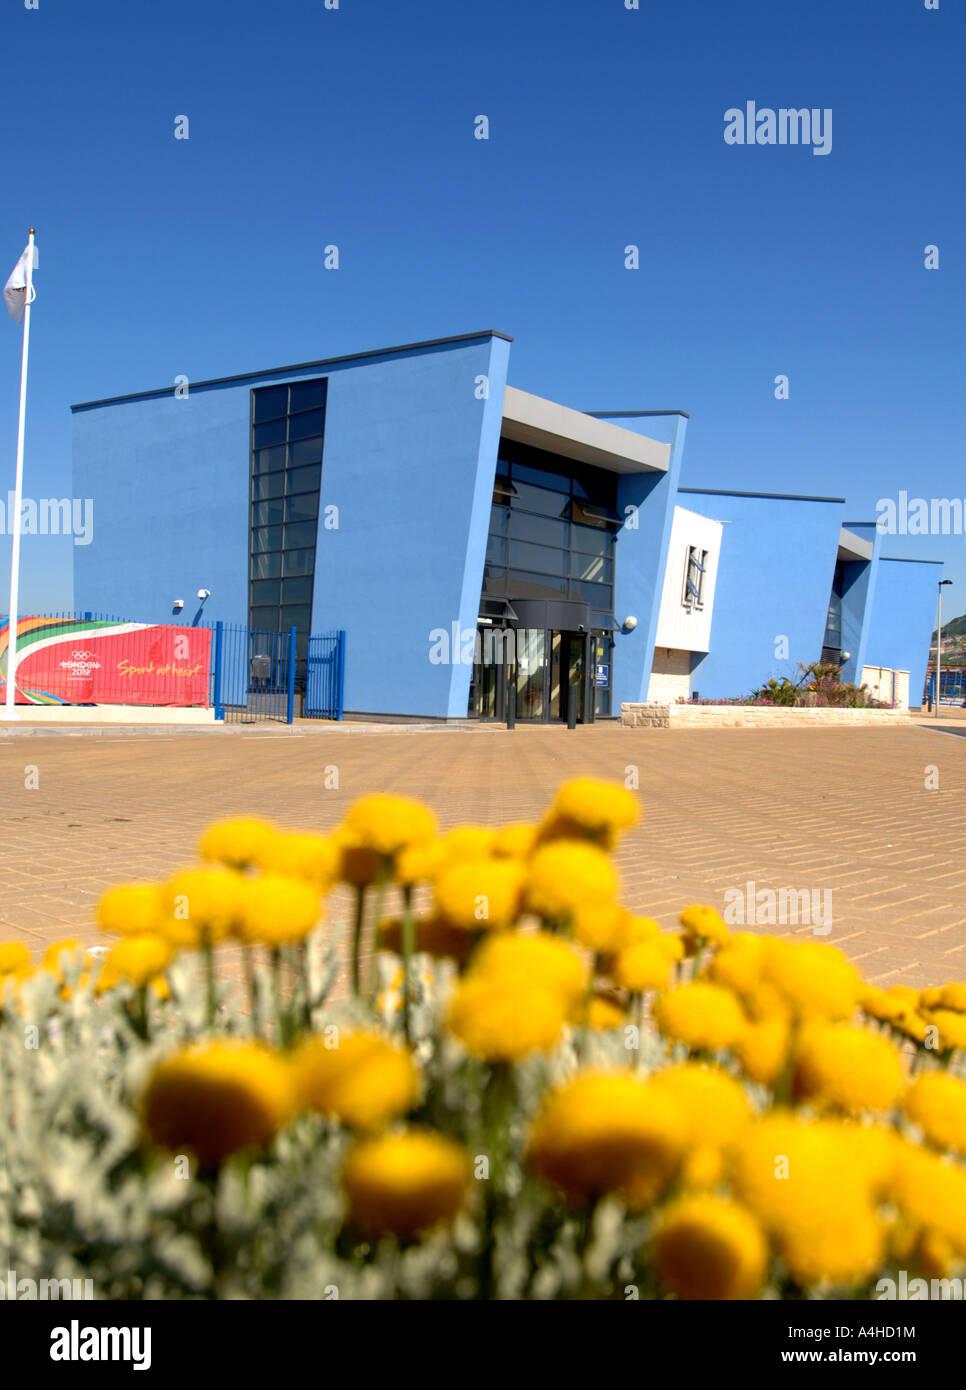 Portland Sailing Academy, Weymouth and Portland Sailing Academy, Portland Dorset Britain UK, location for 2012 Olympic - Stock Image